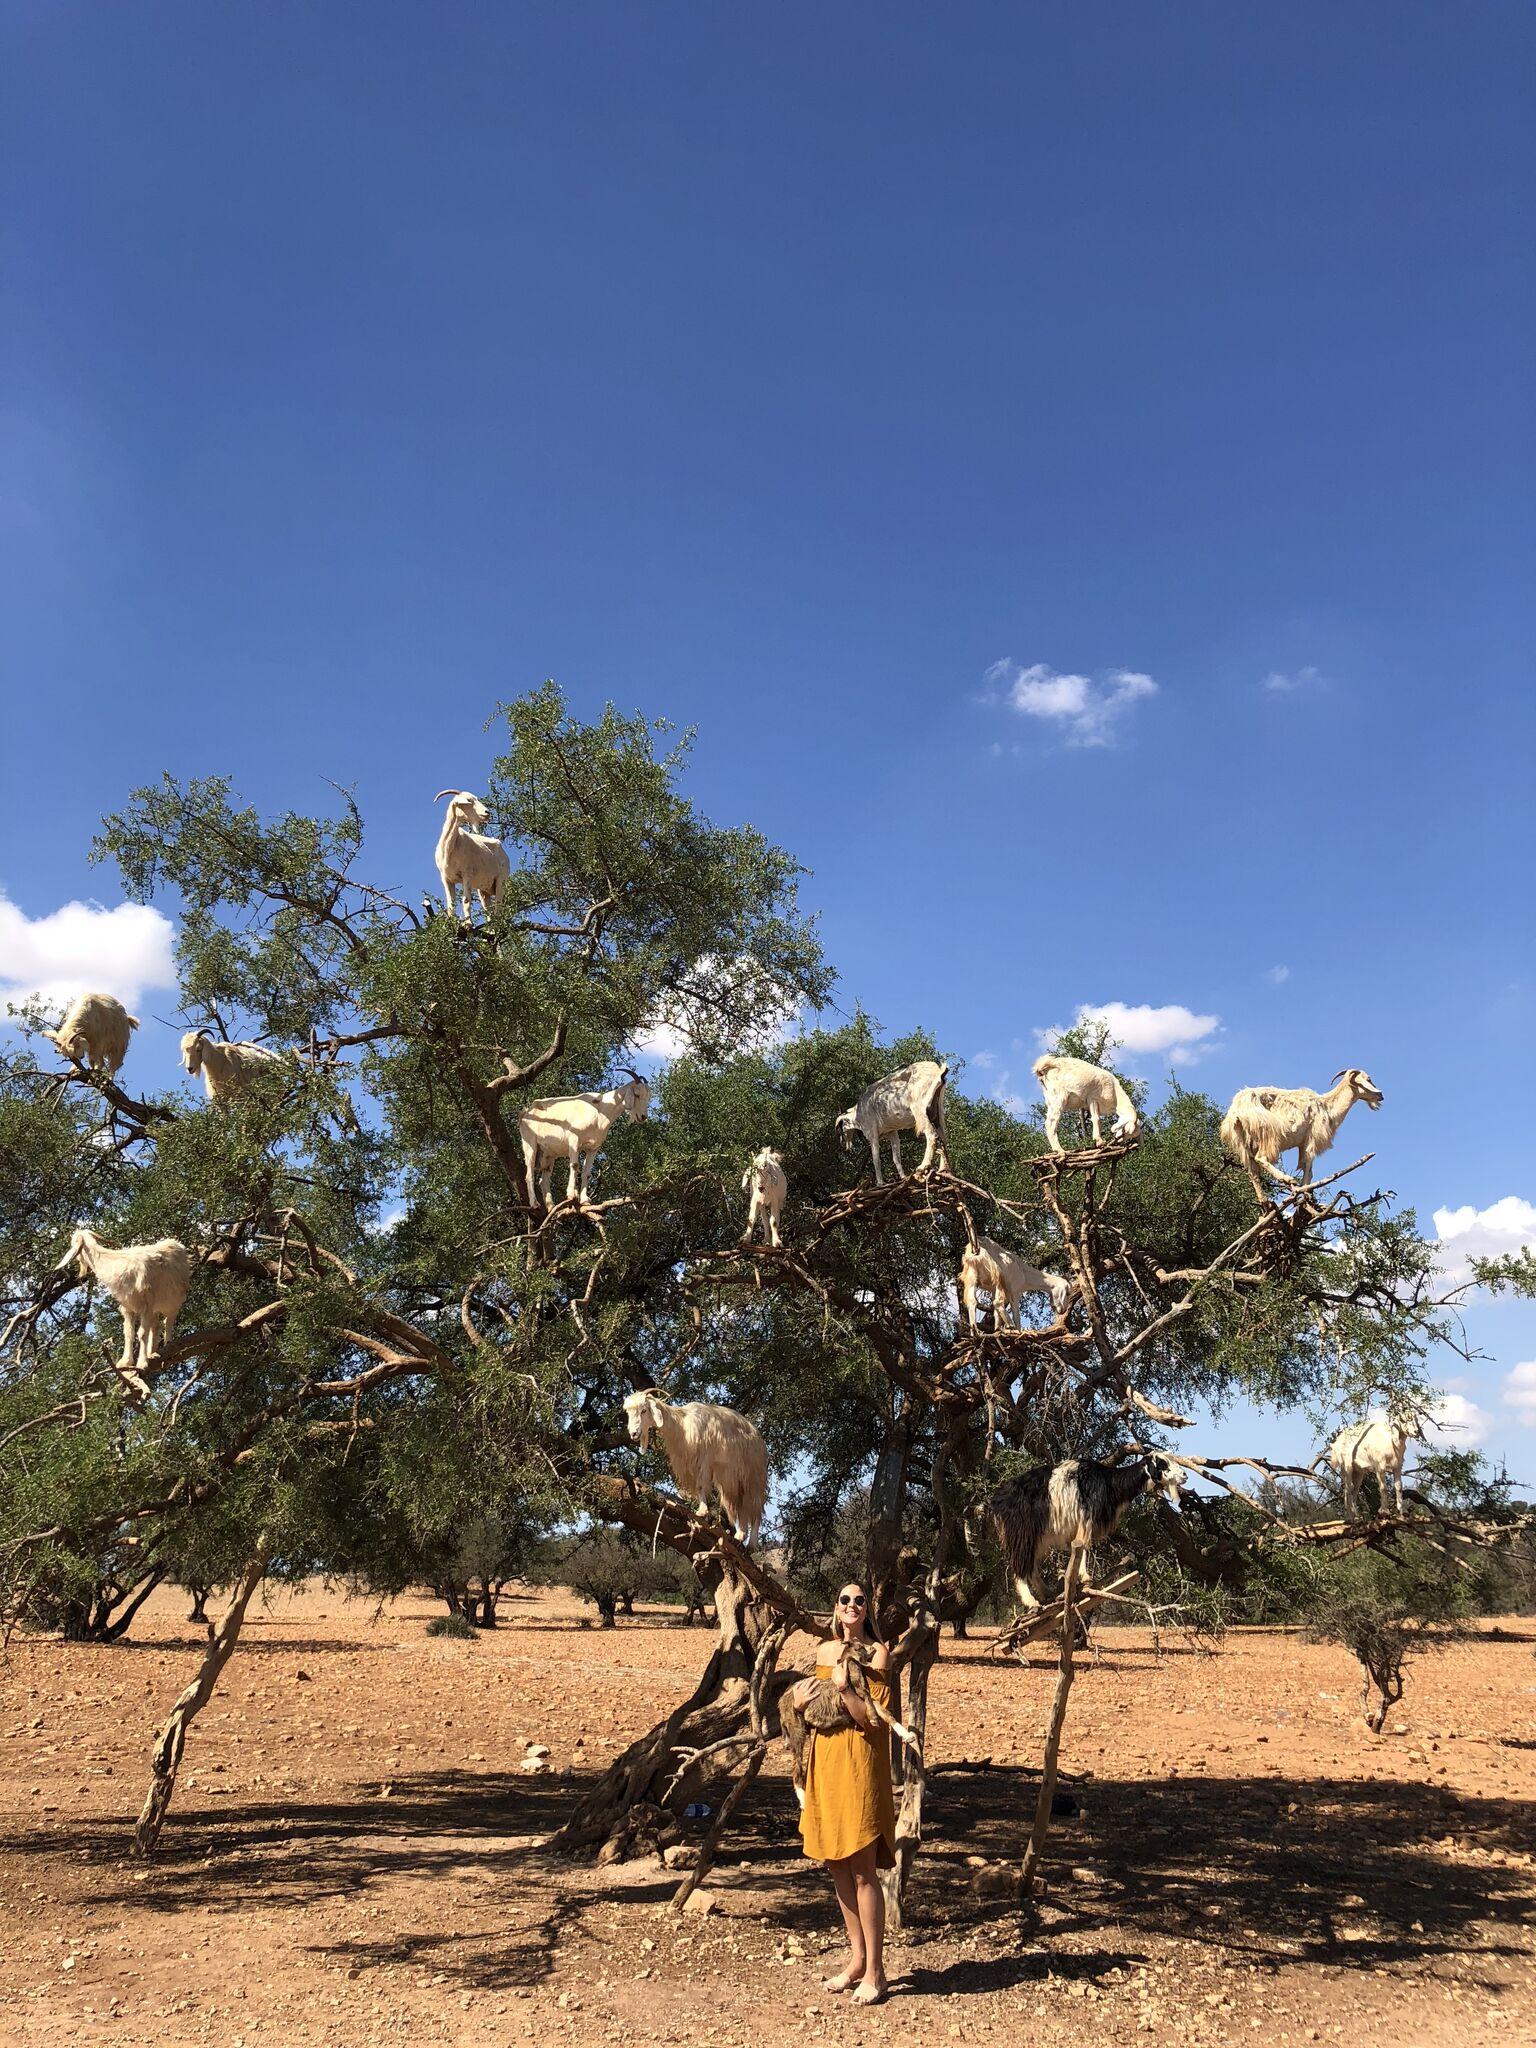 Goat Trees Essaouira.jpg